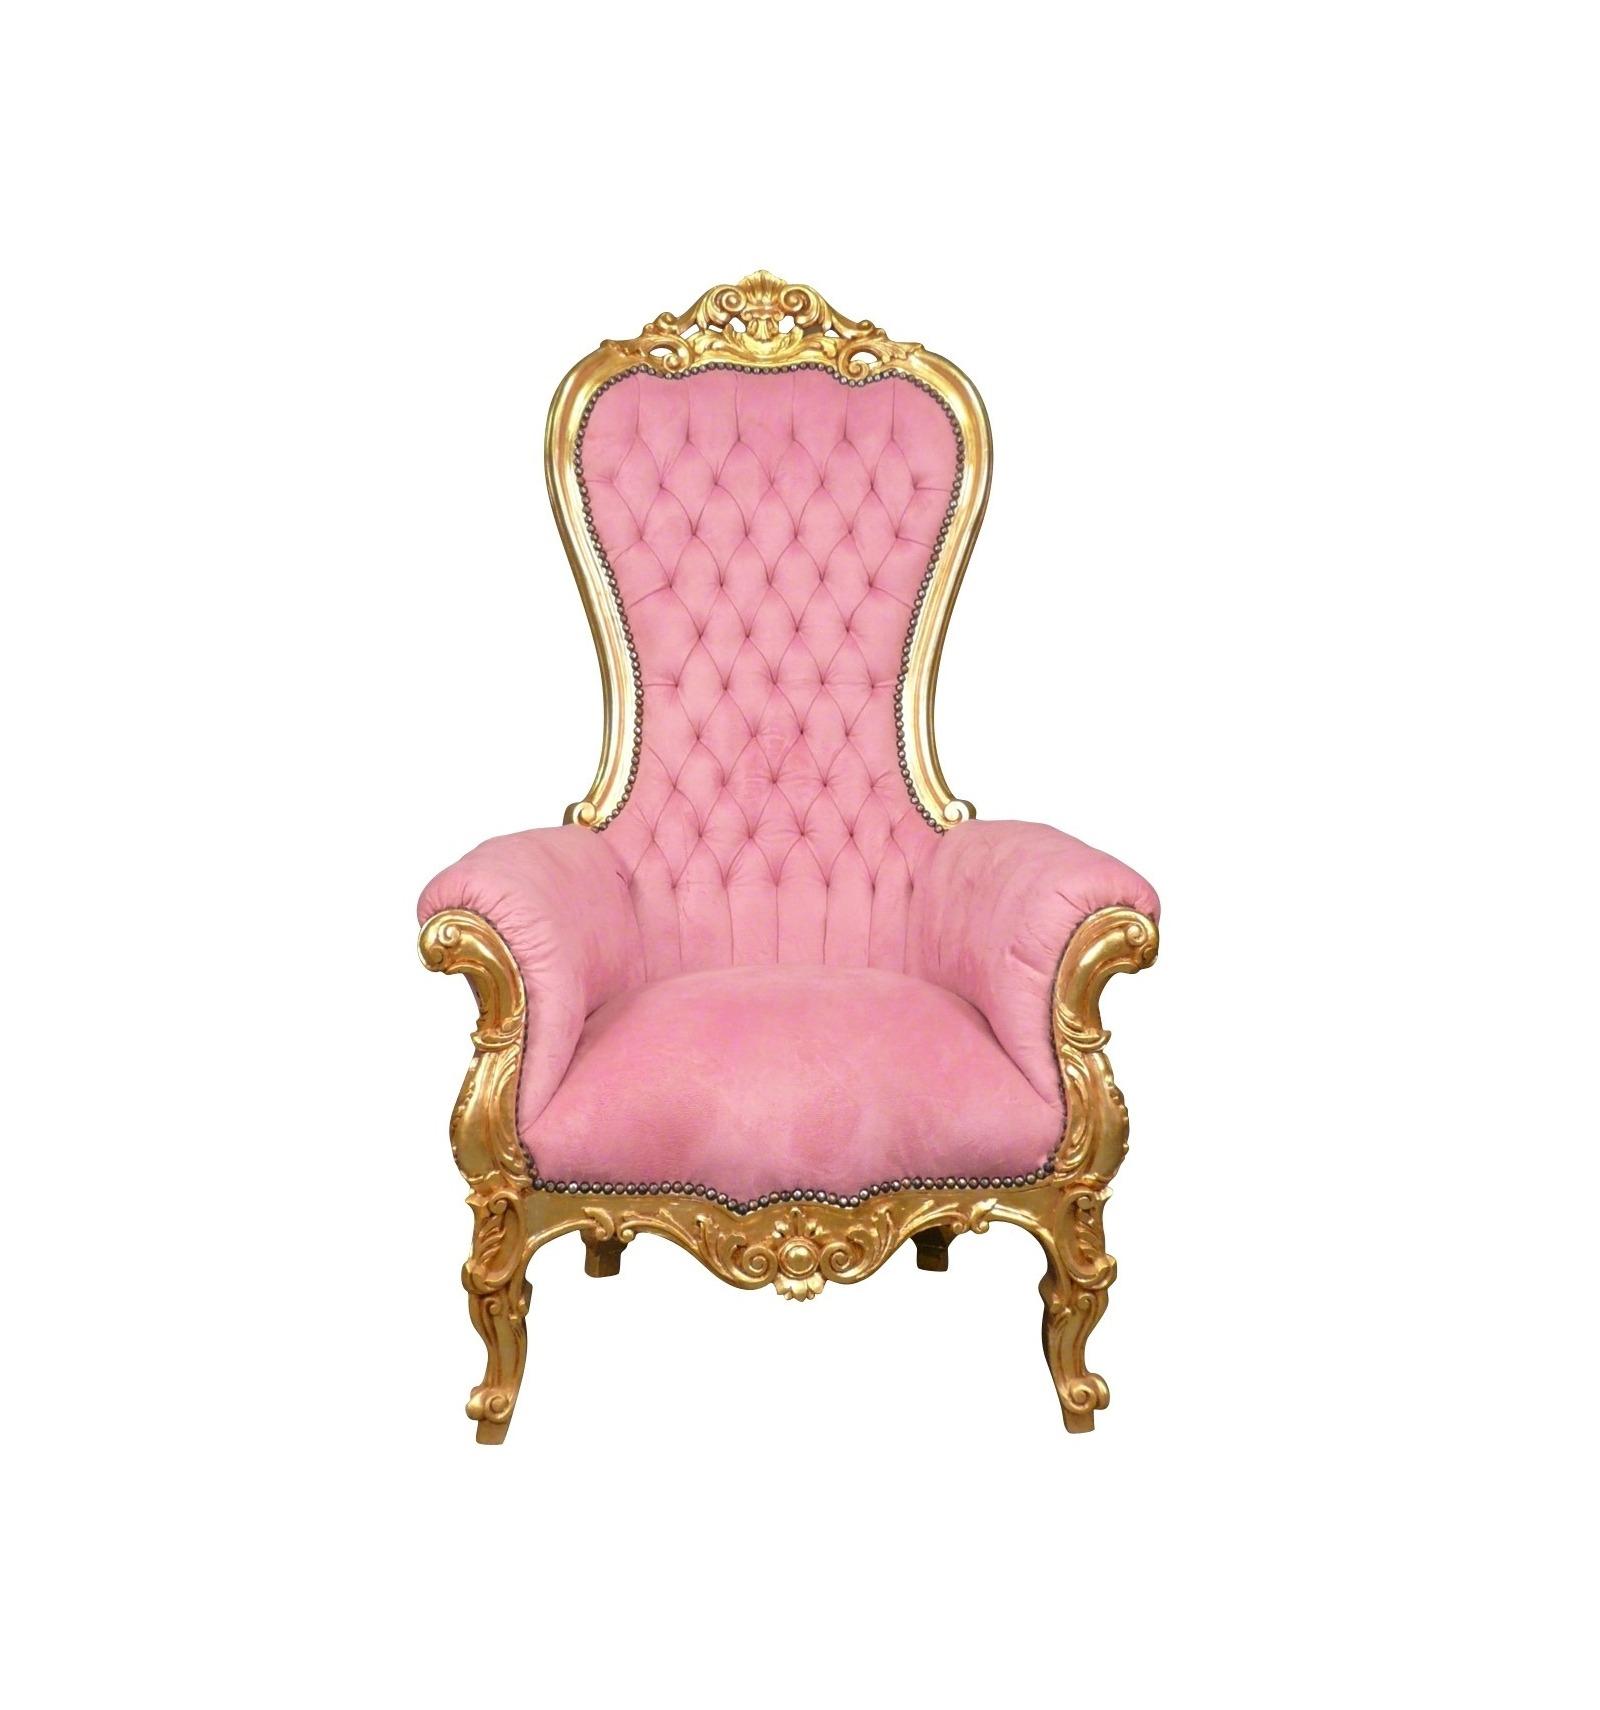 Silln barroco de madera trono sclupt